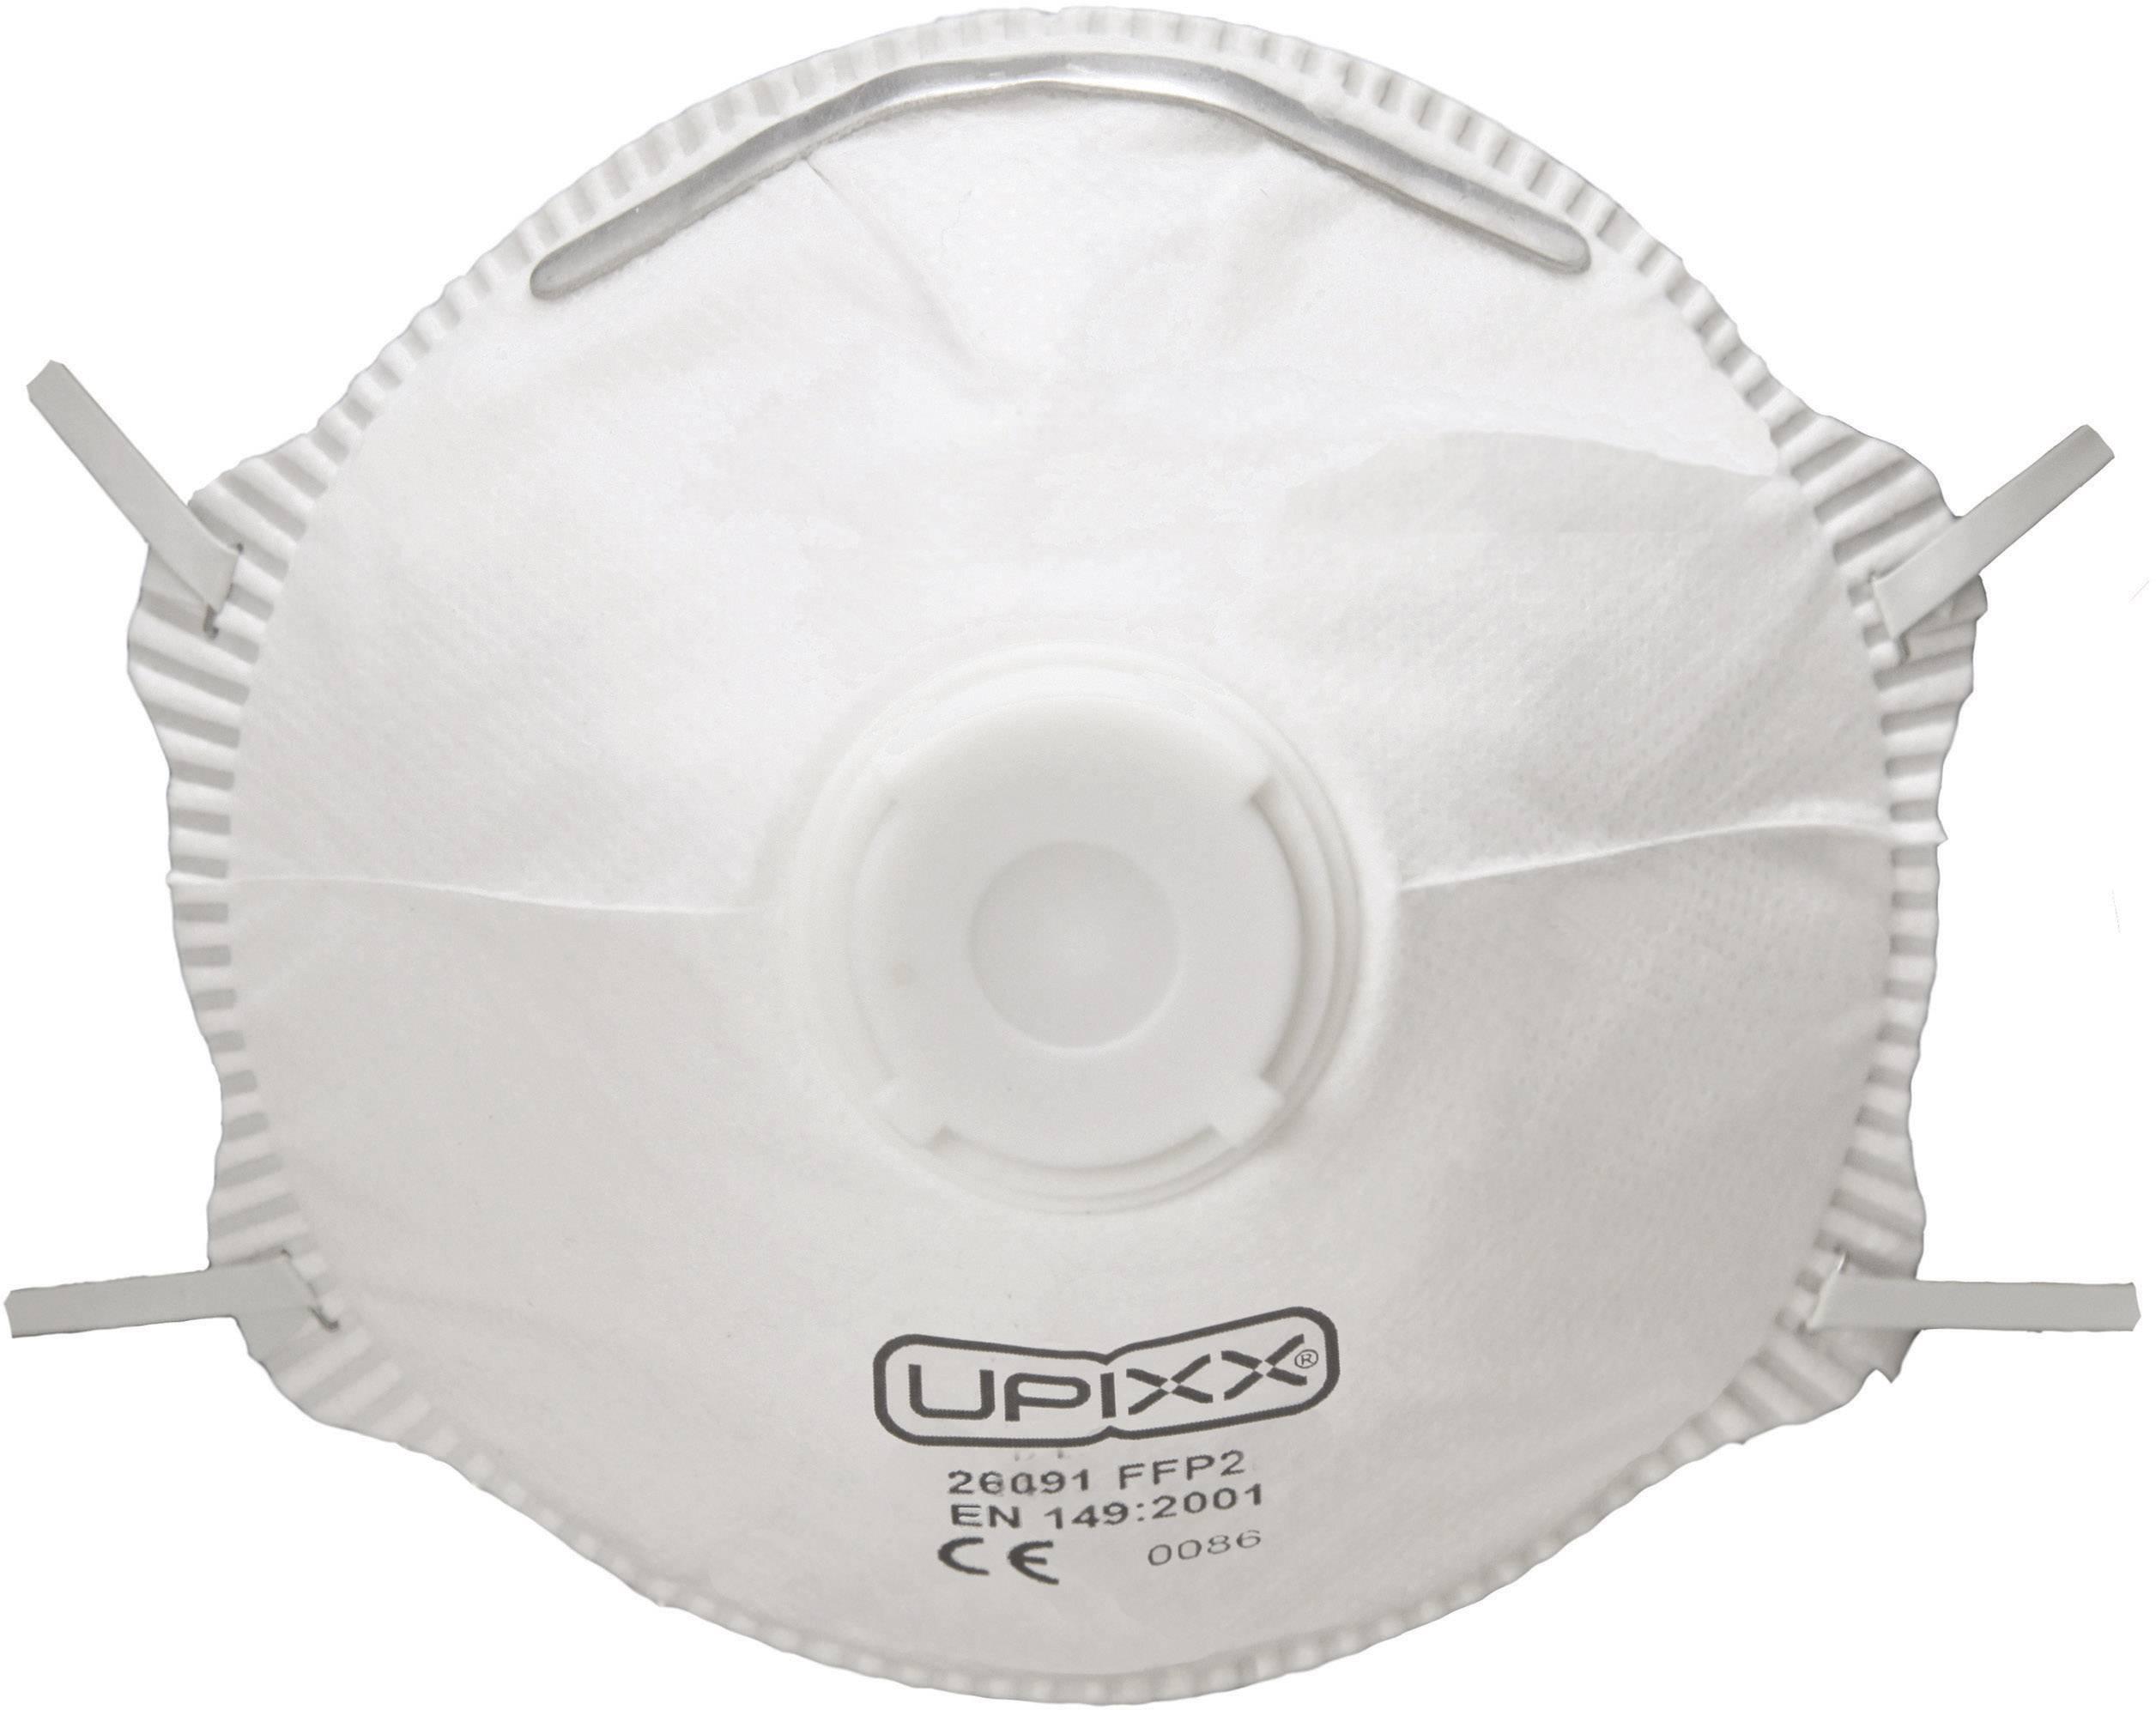 Respirátor proti jemnému prachu, s ventilem Upixx 26091, 1 ks